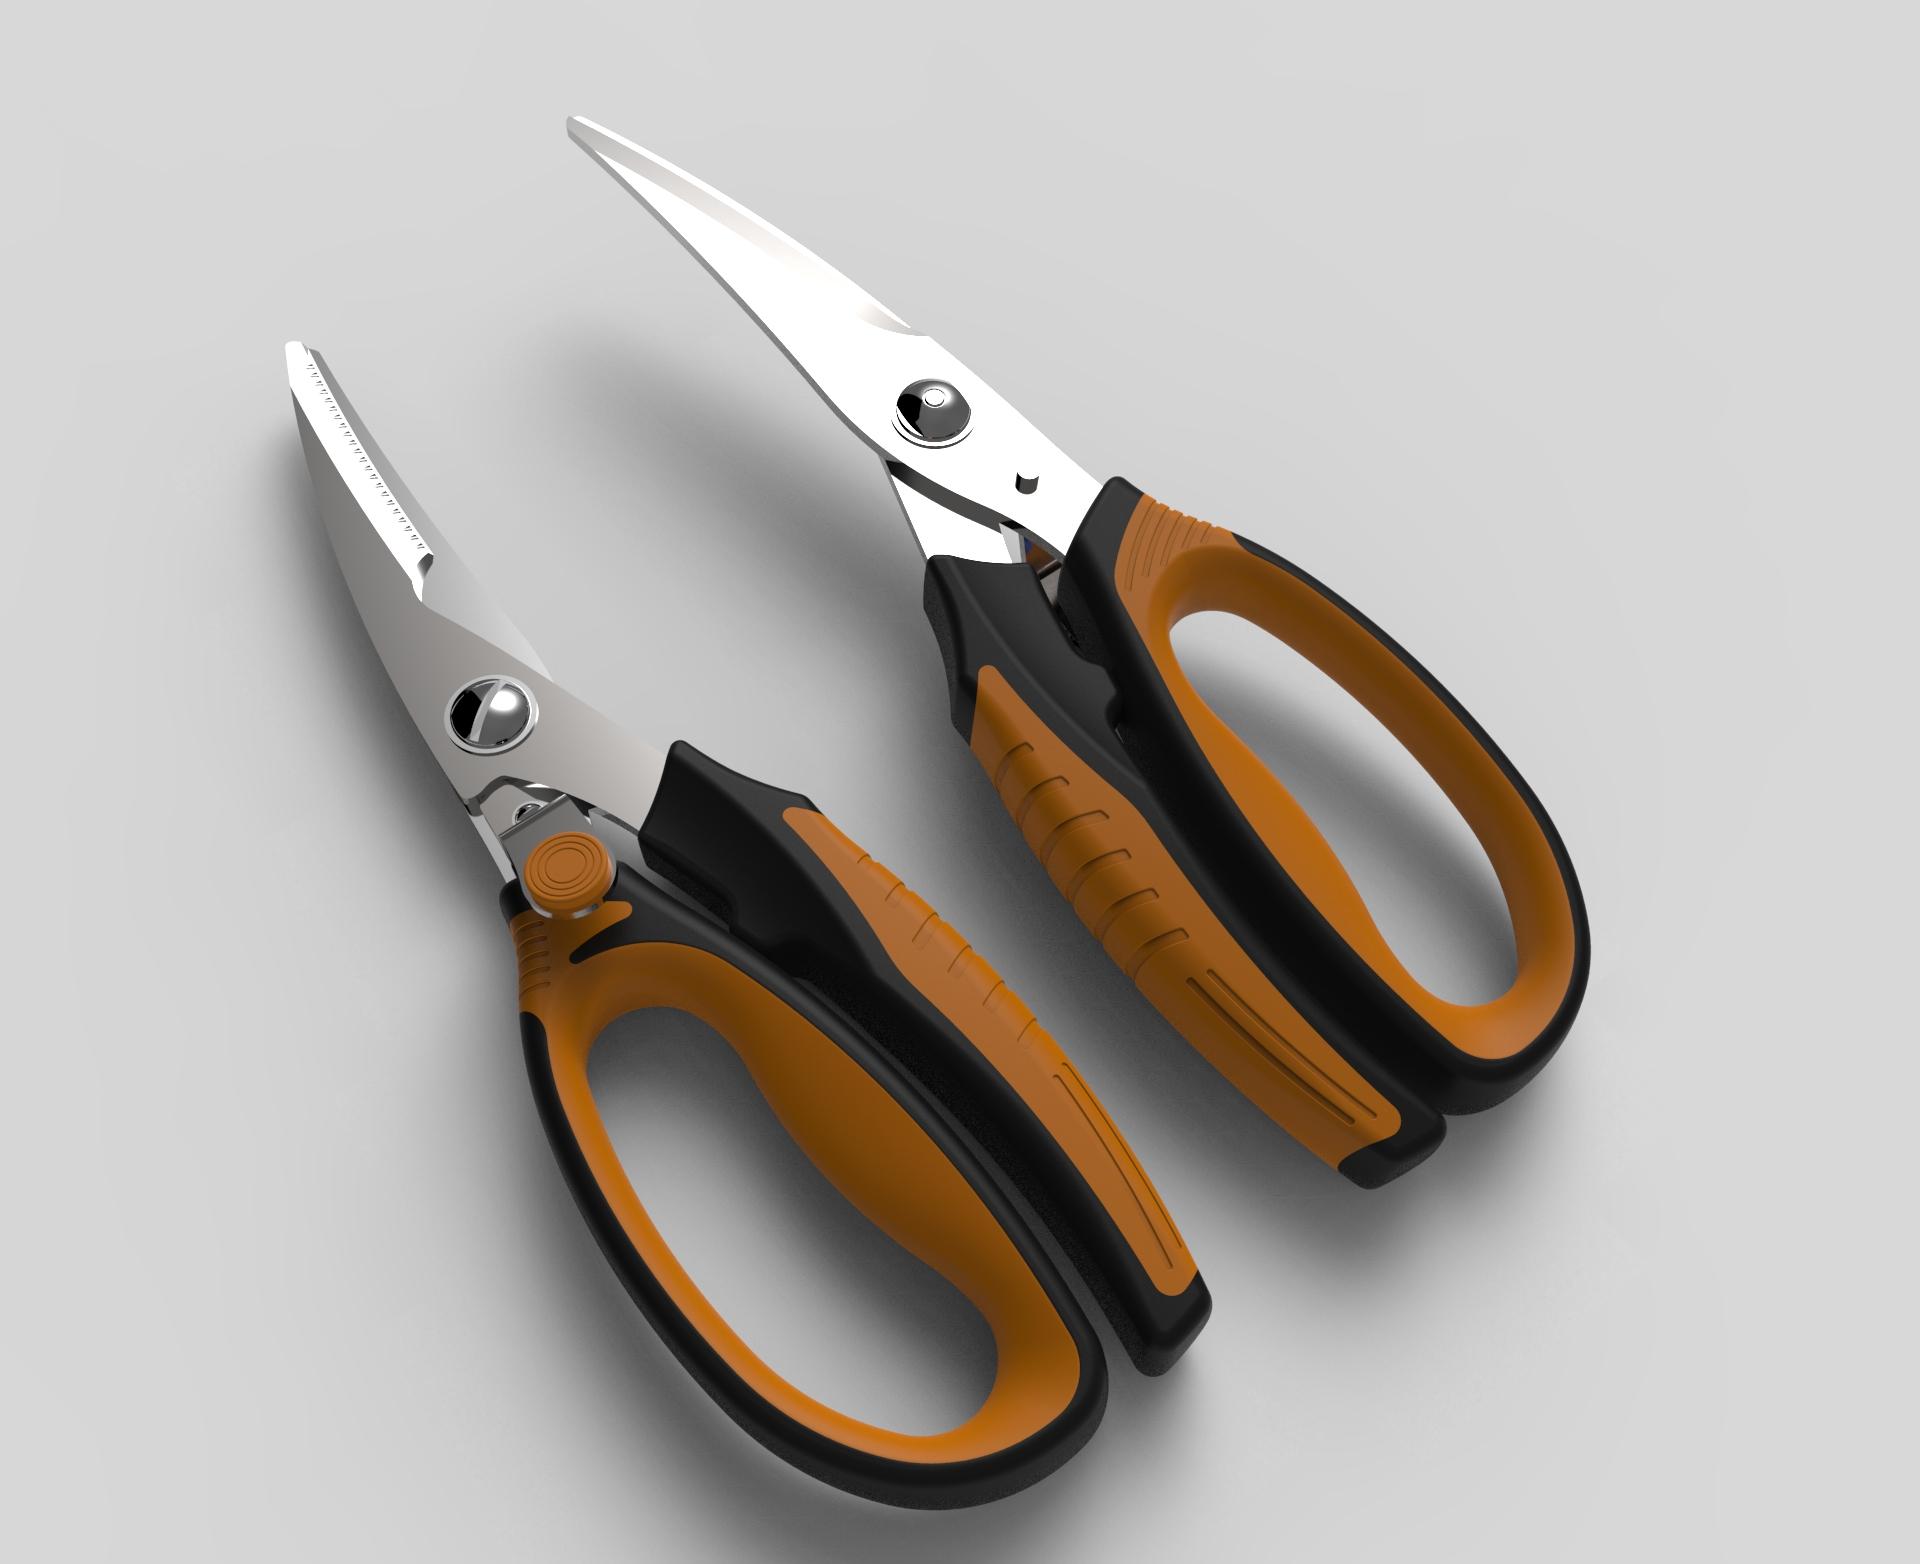 poultry scissors